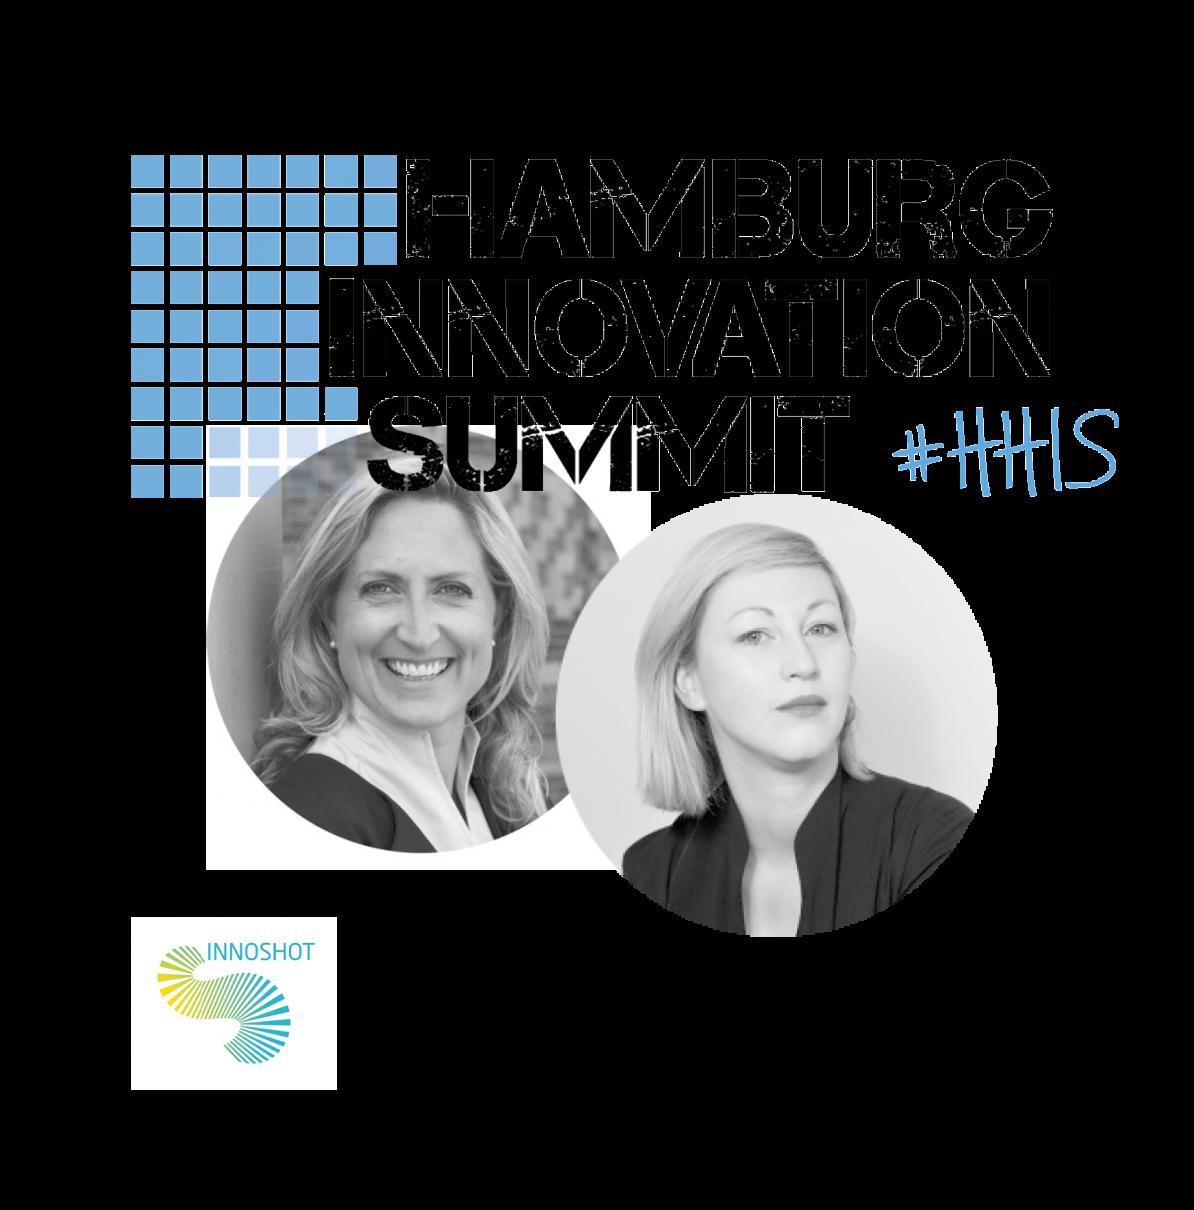 InnovationSummit_HH_2016